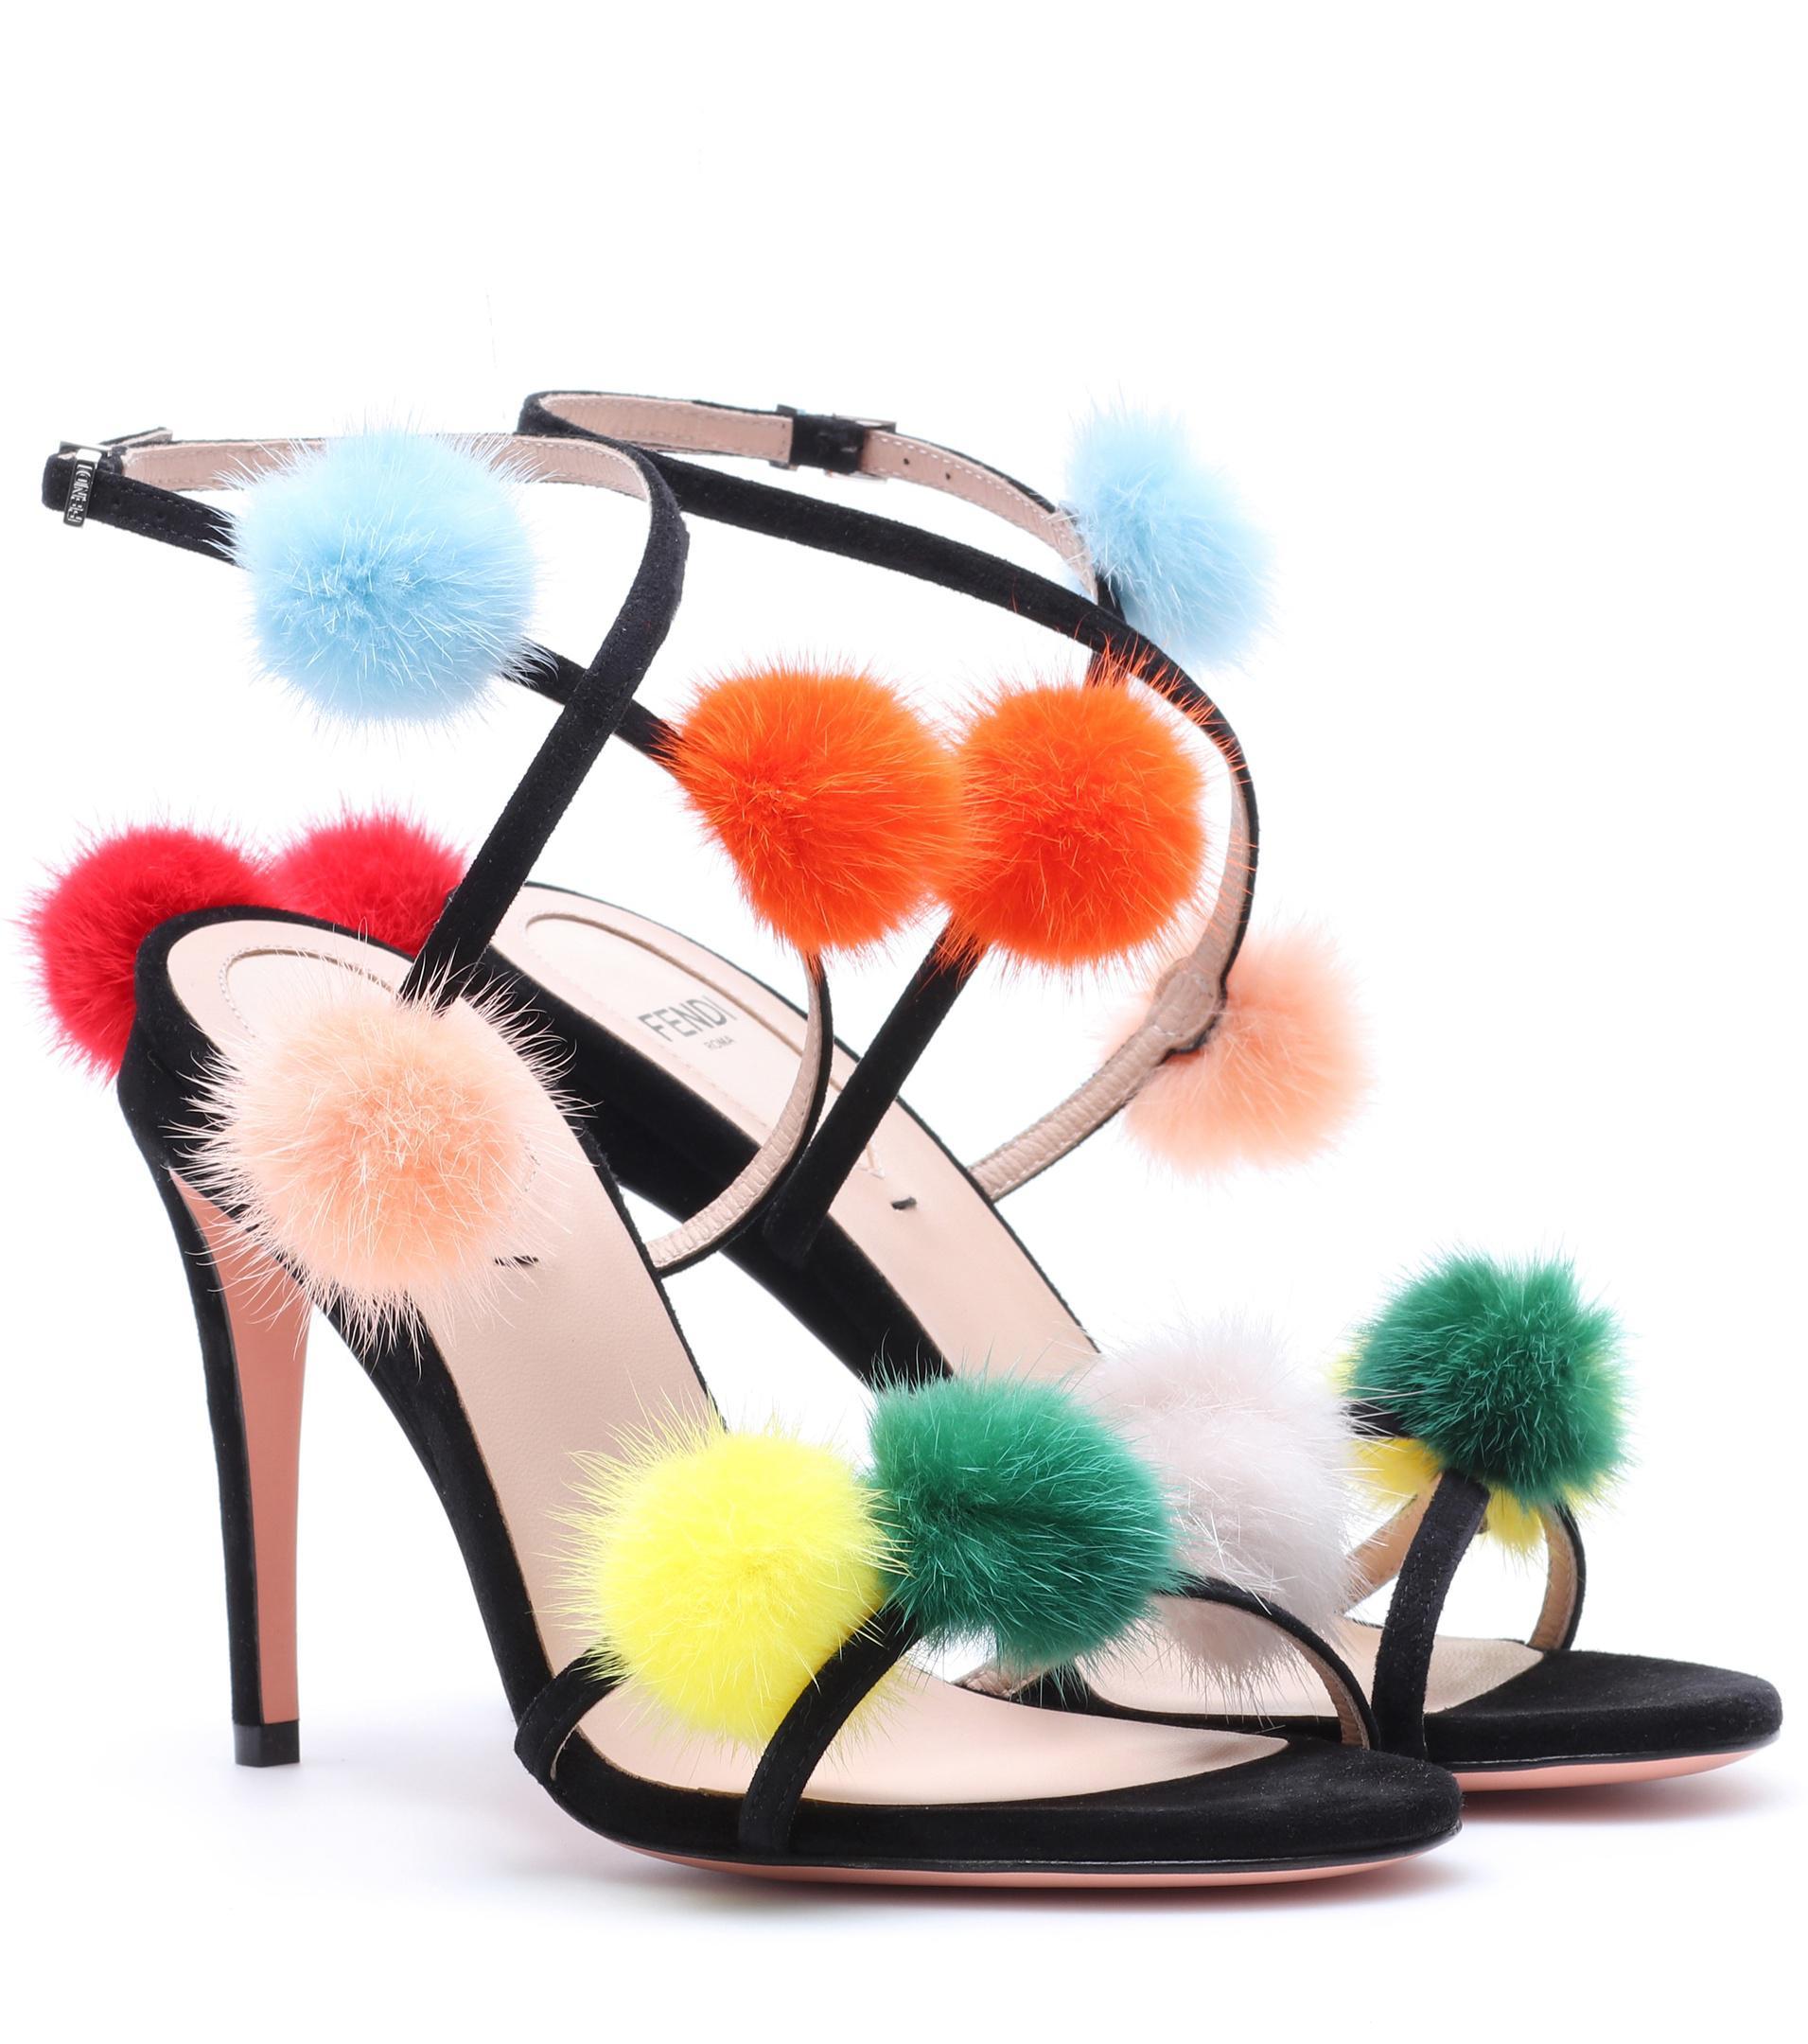 Fendi Mink-Trimmed Suede Sandals very cheap price UjcHfI